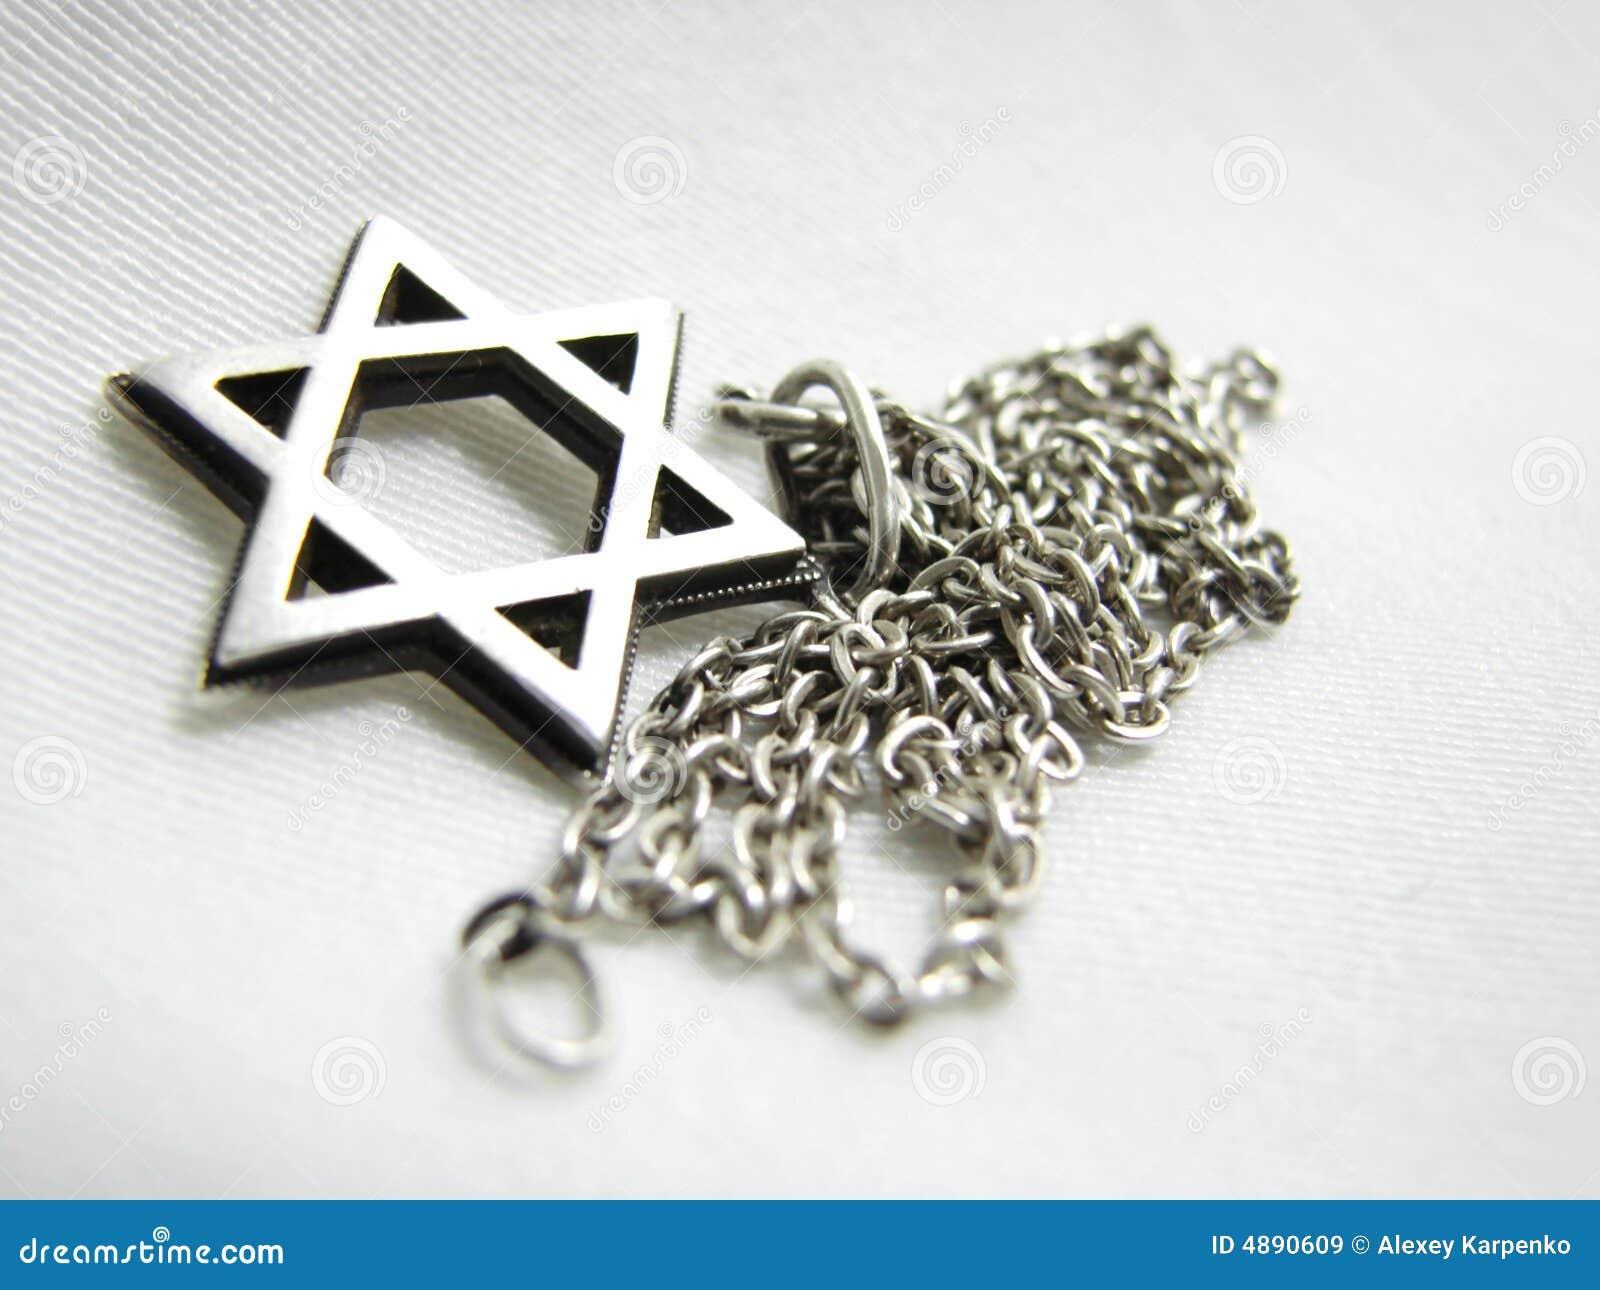 звезда Давида 2 крупных планов серебряная